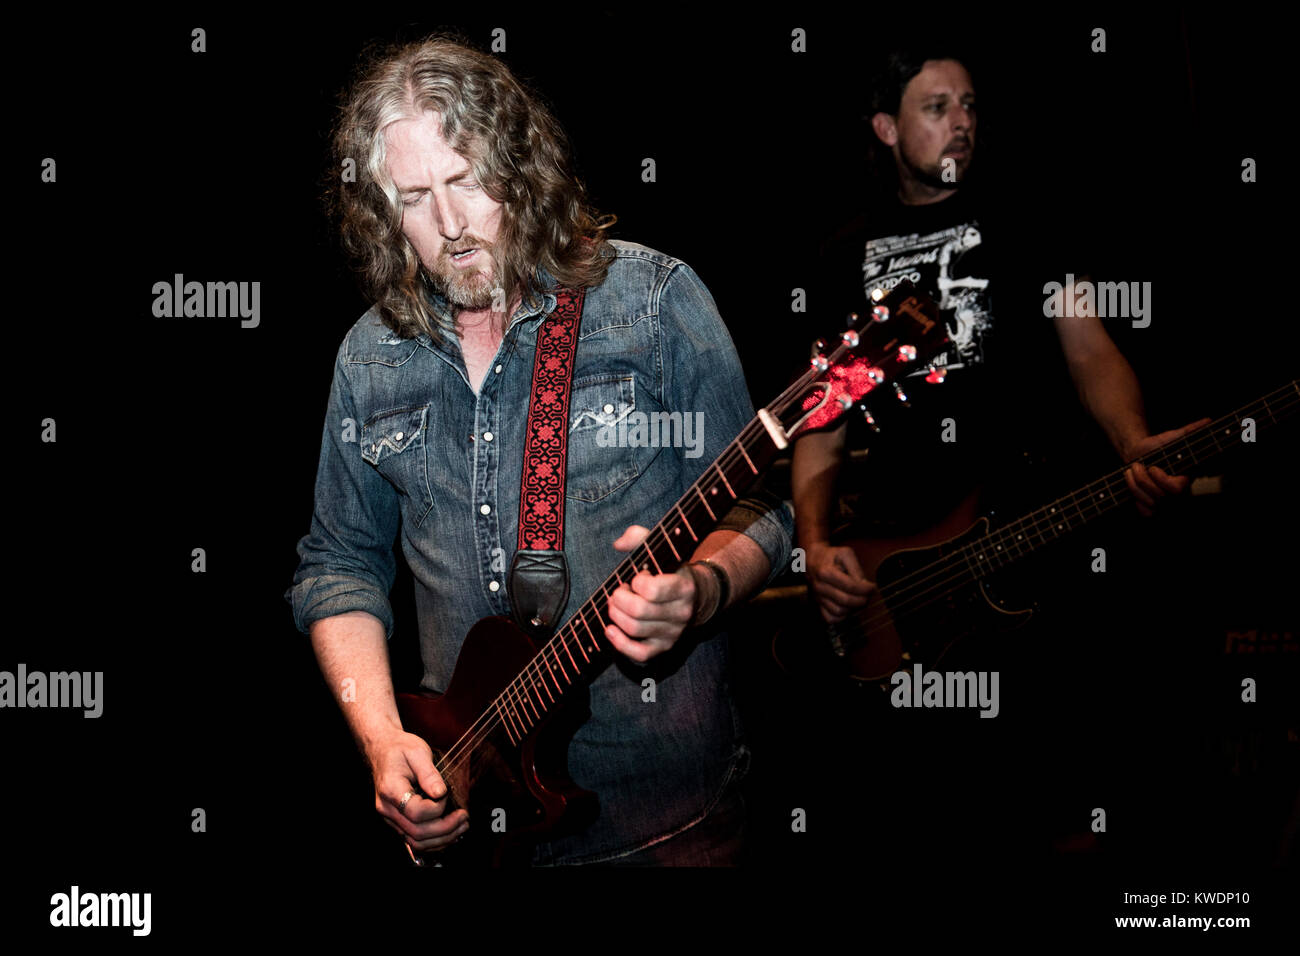 Barcelona, Spain. October 27, 2017. Concert by Leadfinger in Marula Café. Organized by A Wamba Buluba. Photographer: - Stock Image